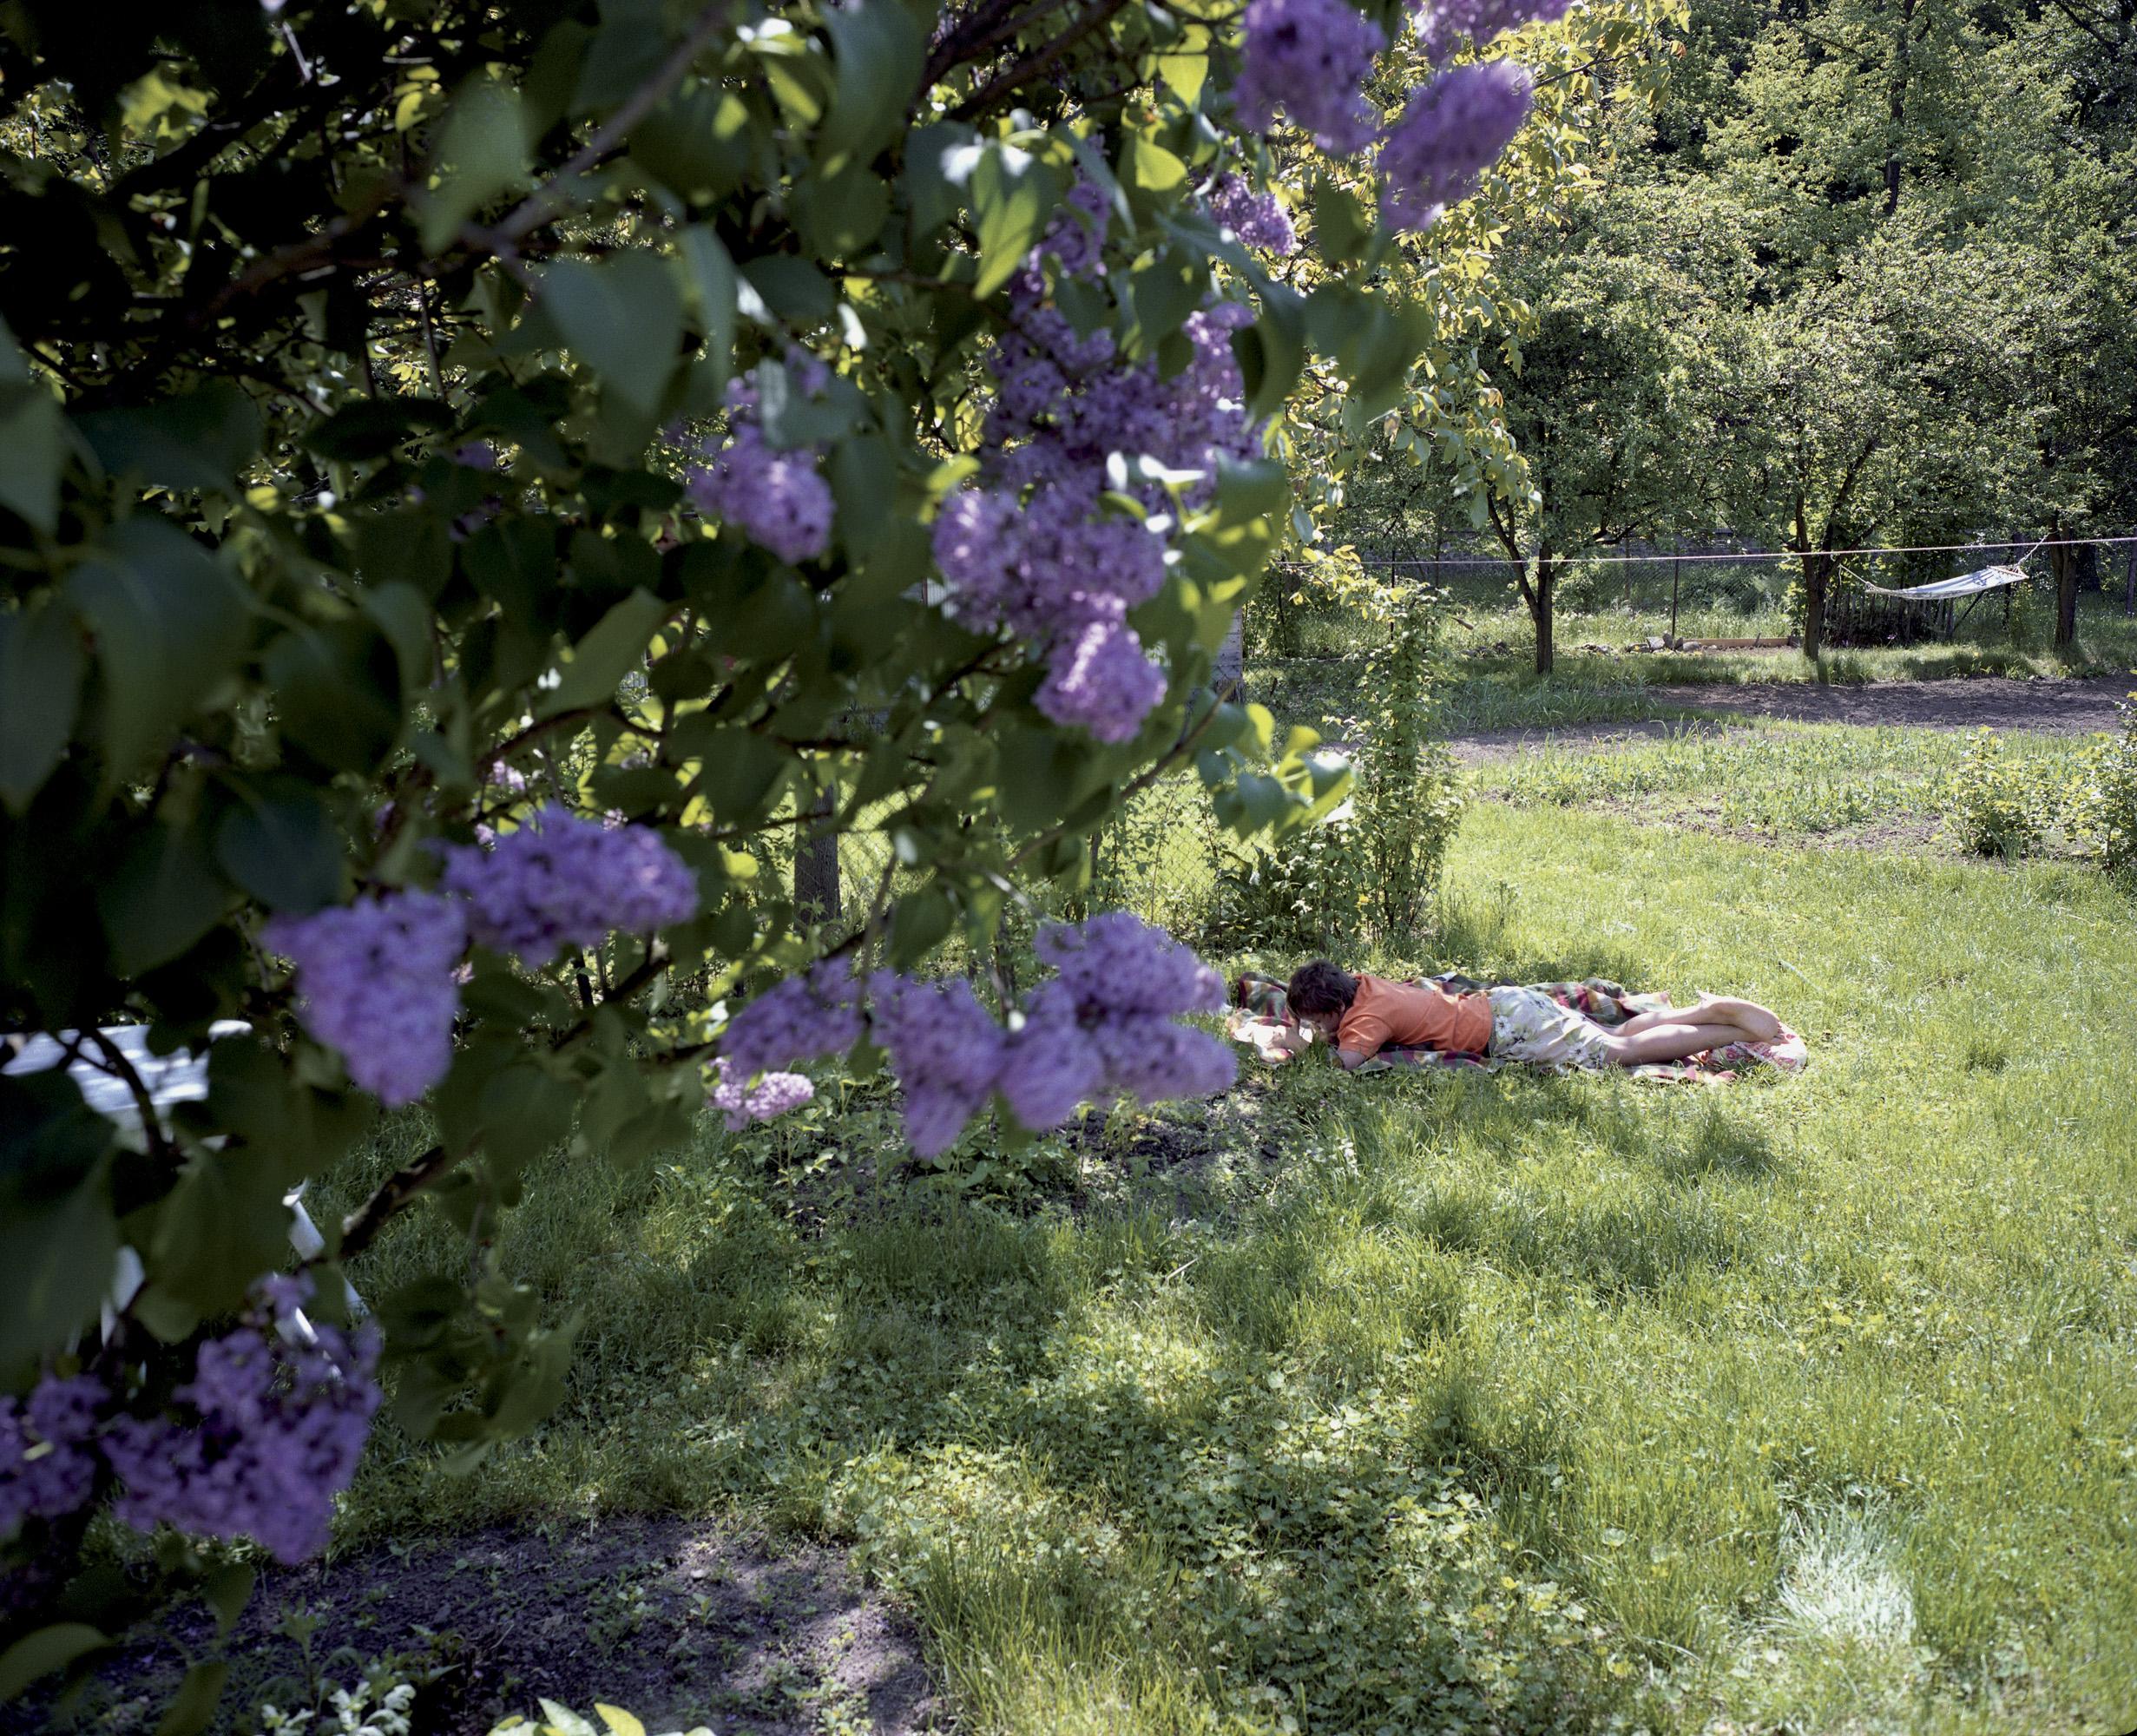 sundays-of-life-bela-doka-11.jpg